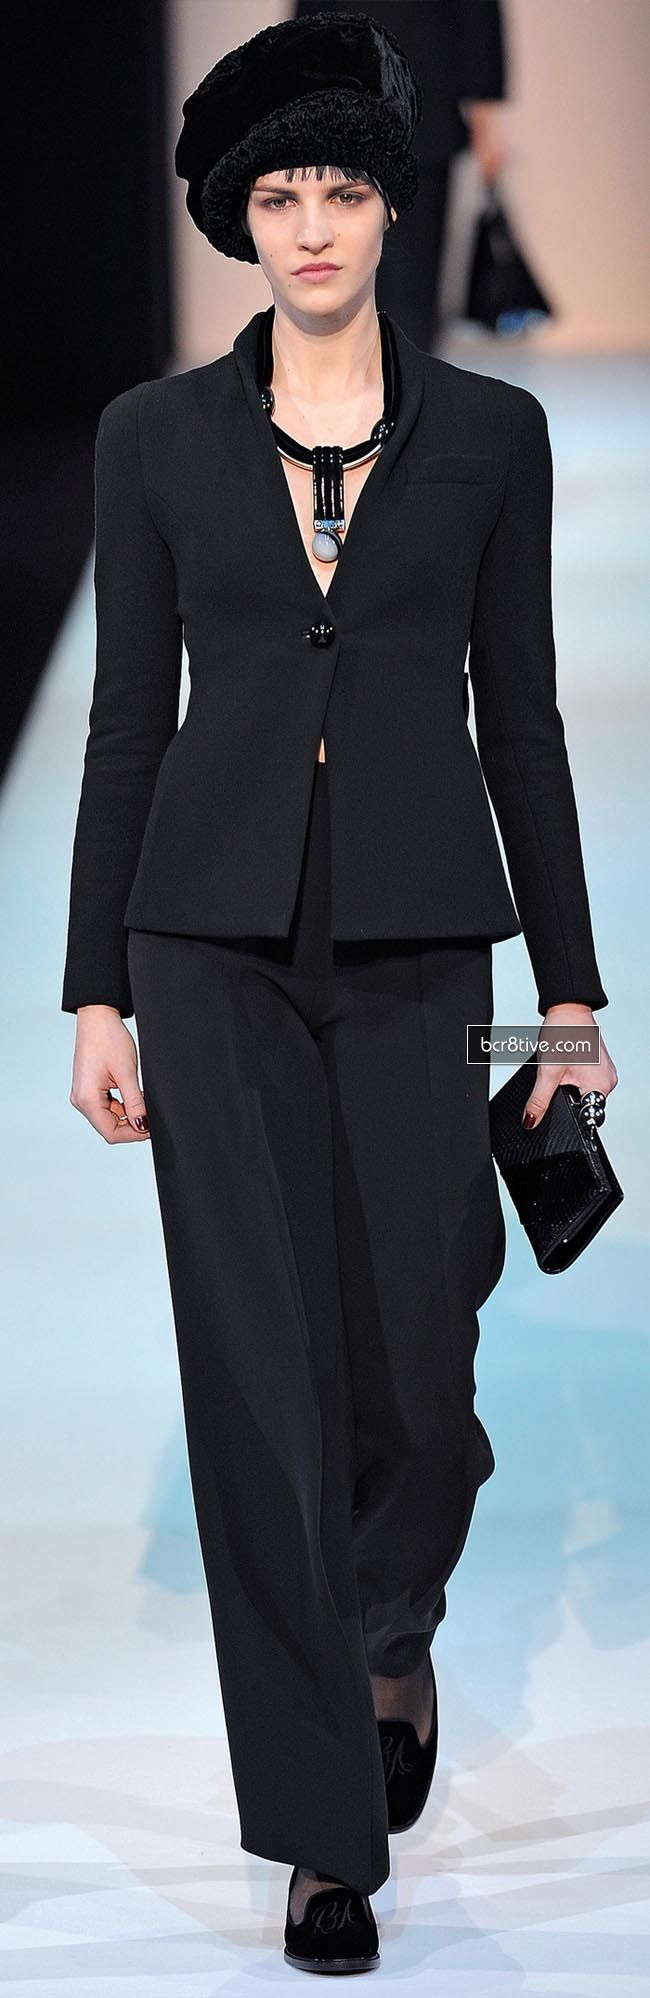 Giorgio Armani Fall Winter 2013-14 Collection. Looks like Downton Abby has influenced the fashions for next season.